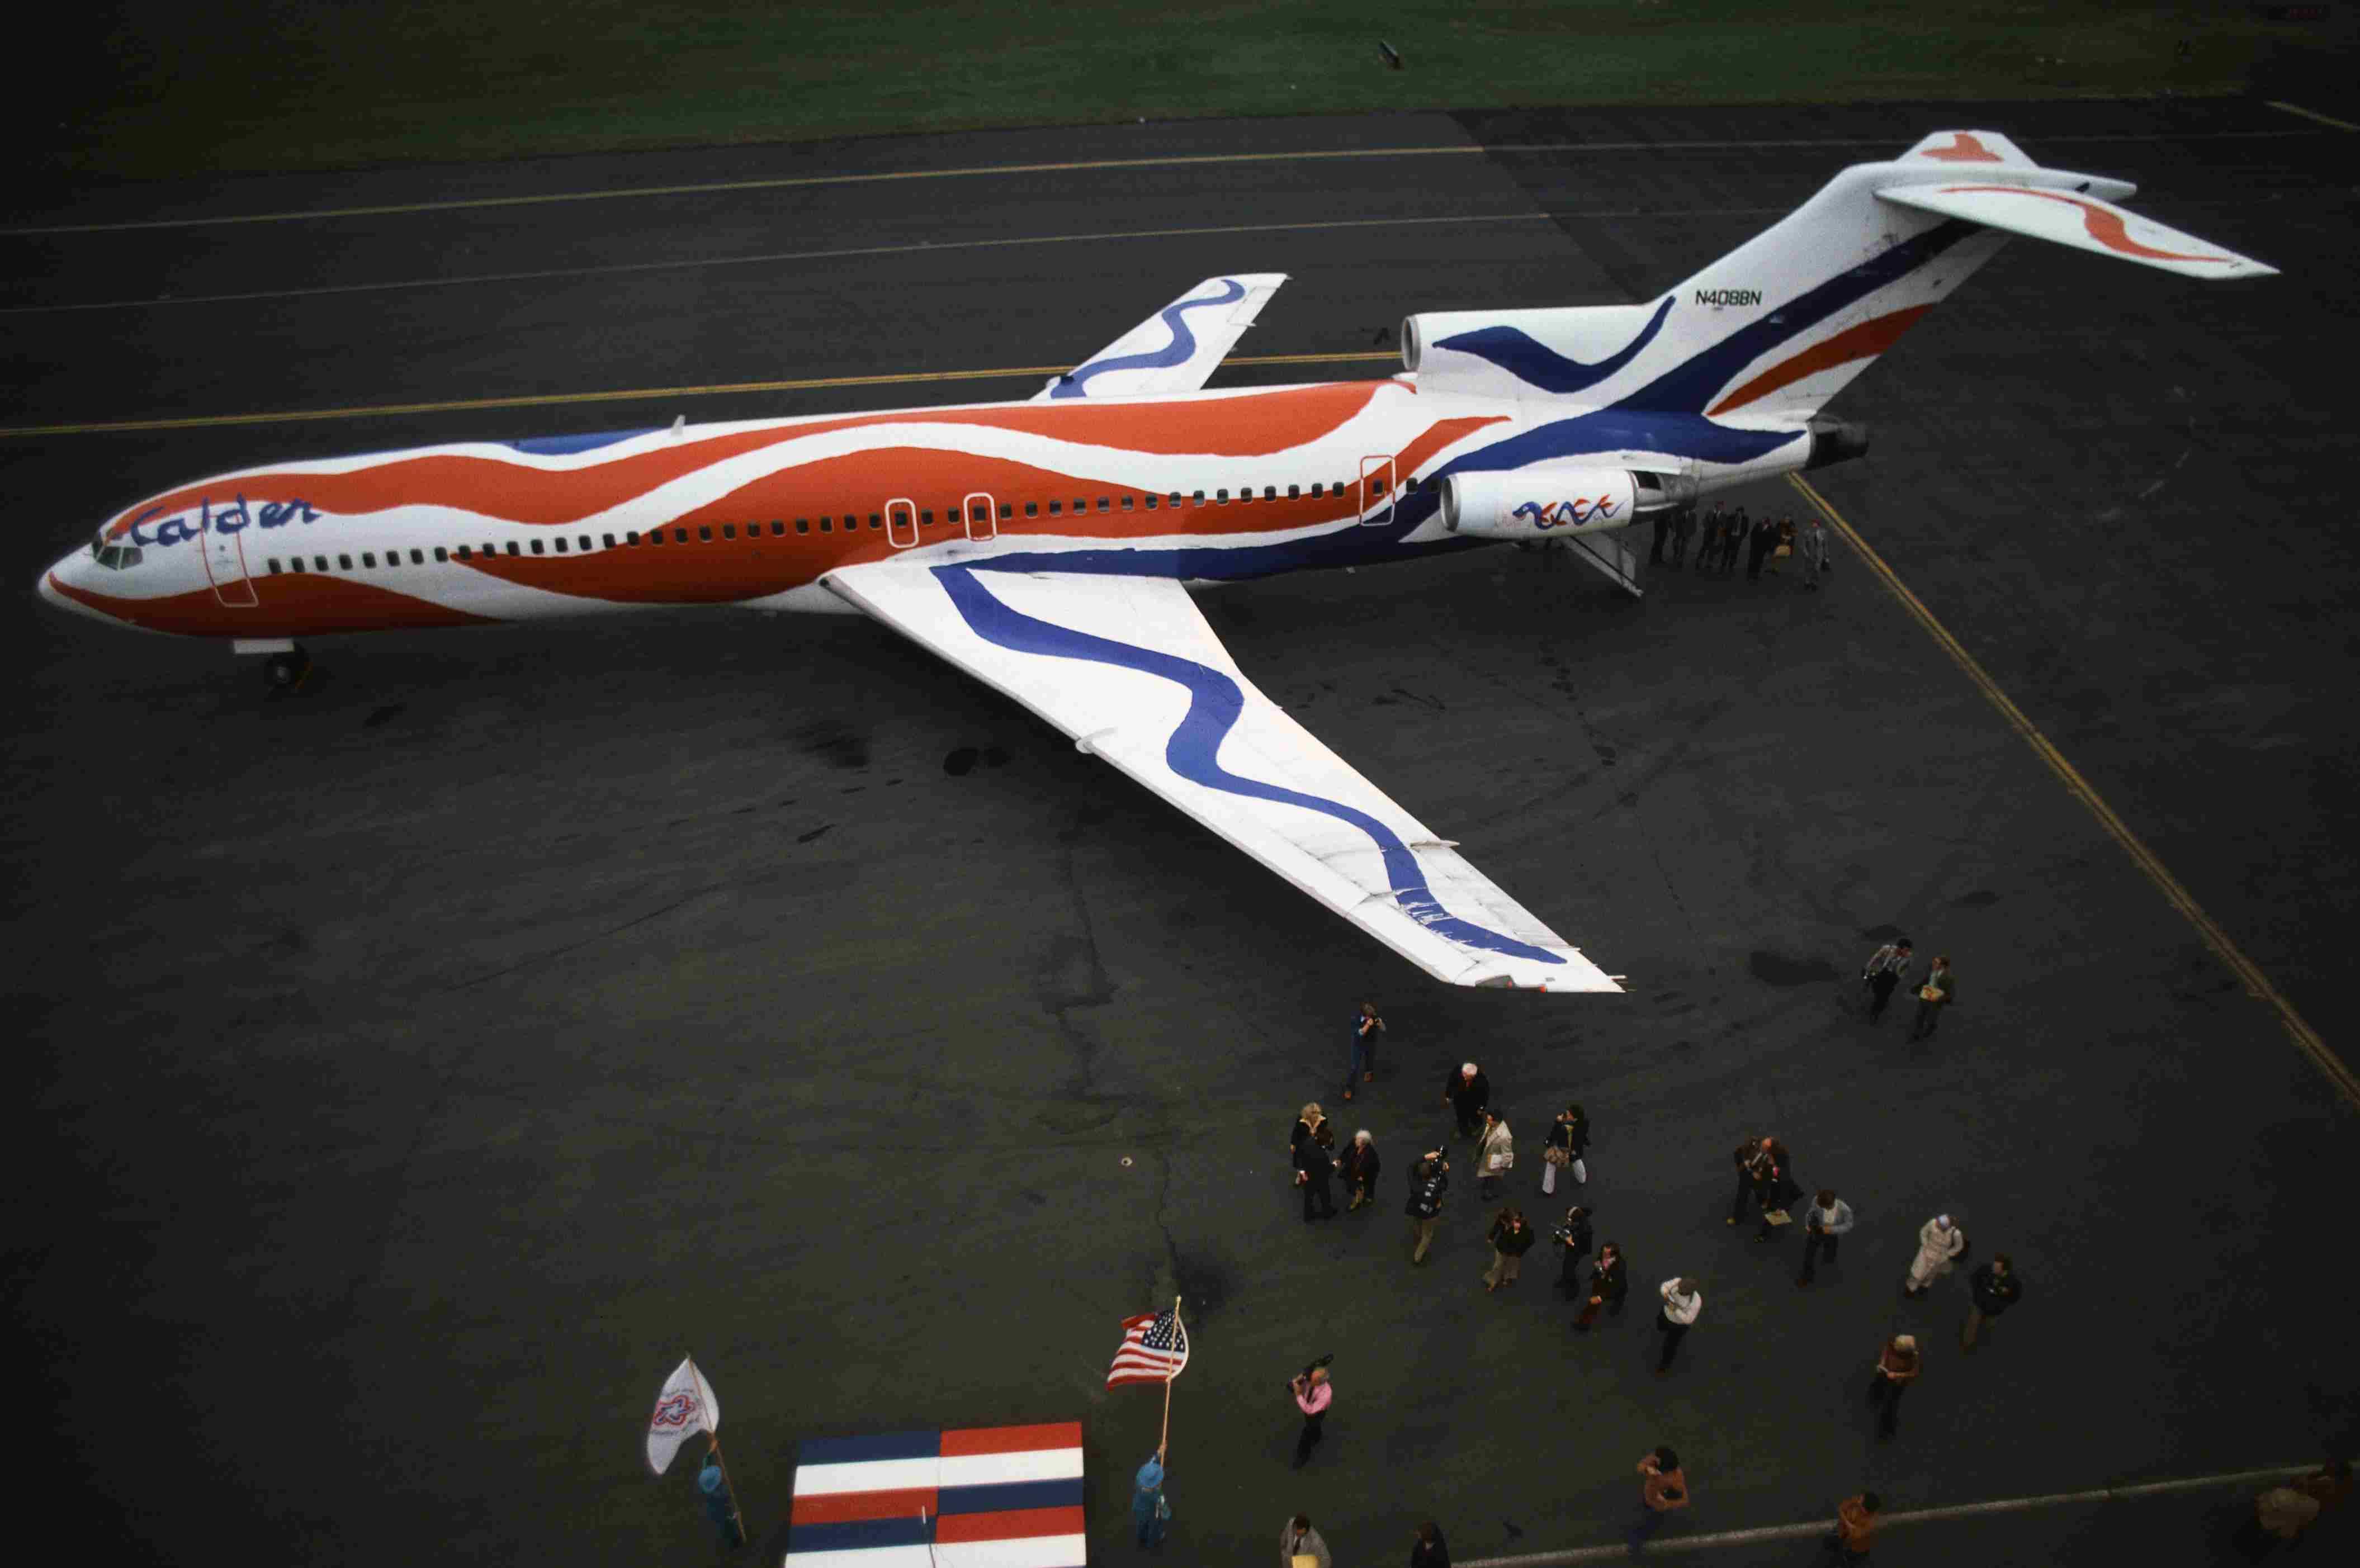 Alexander Calder painted airplane